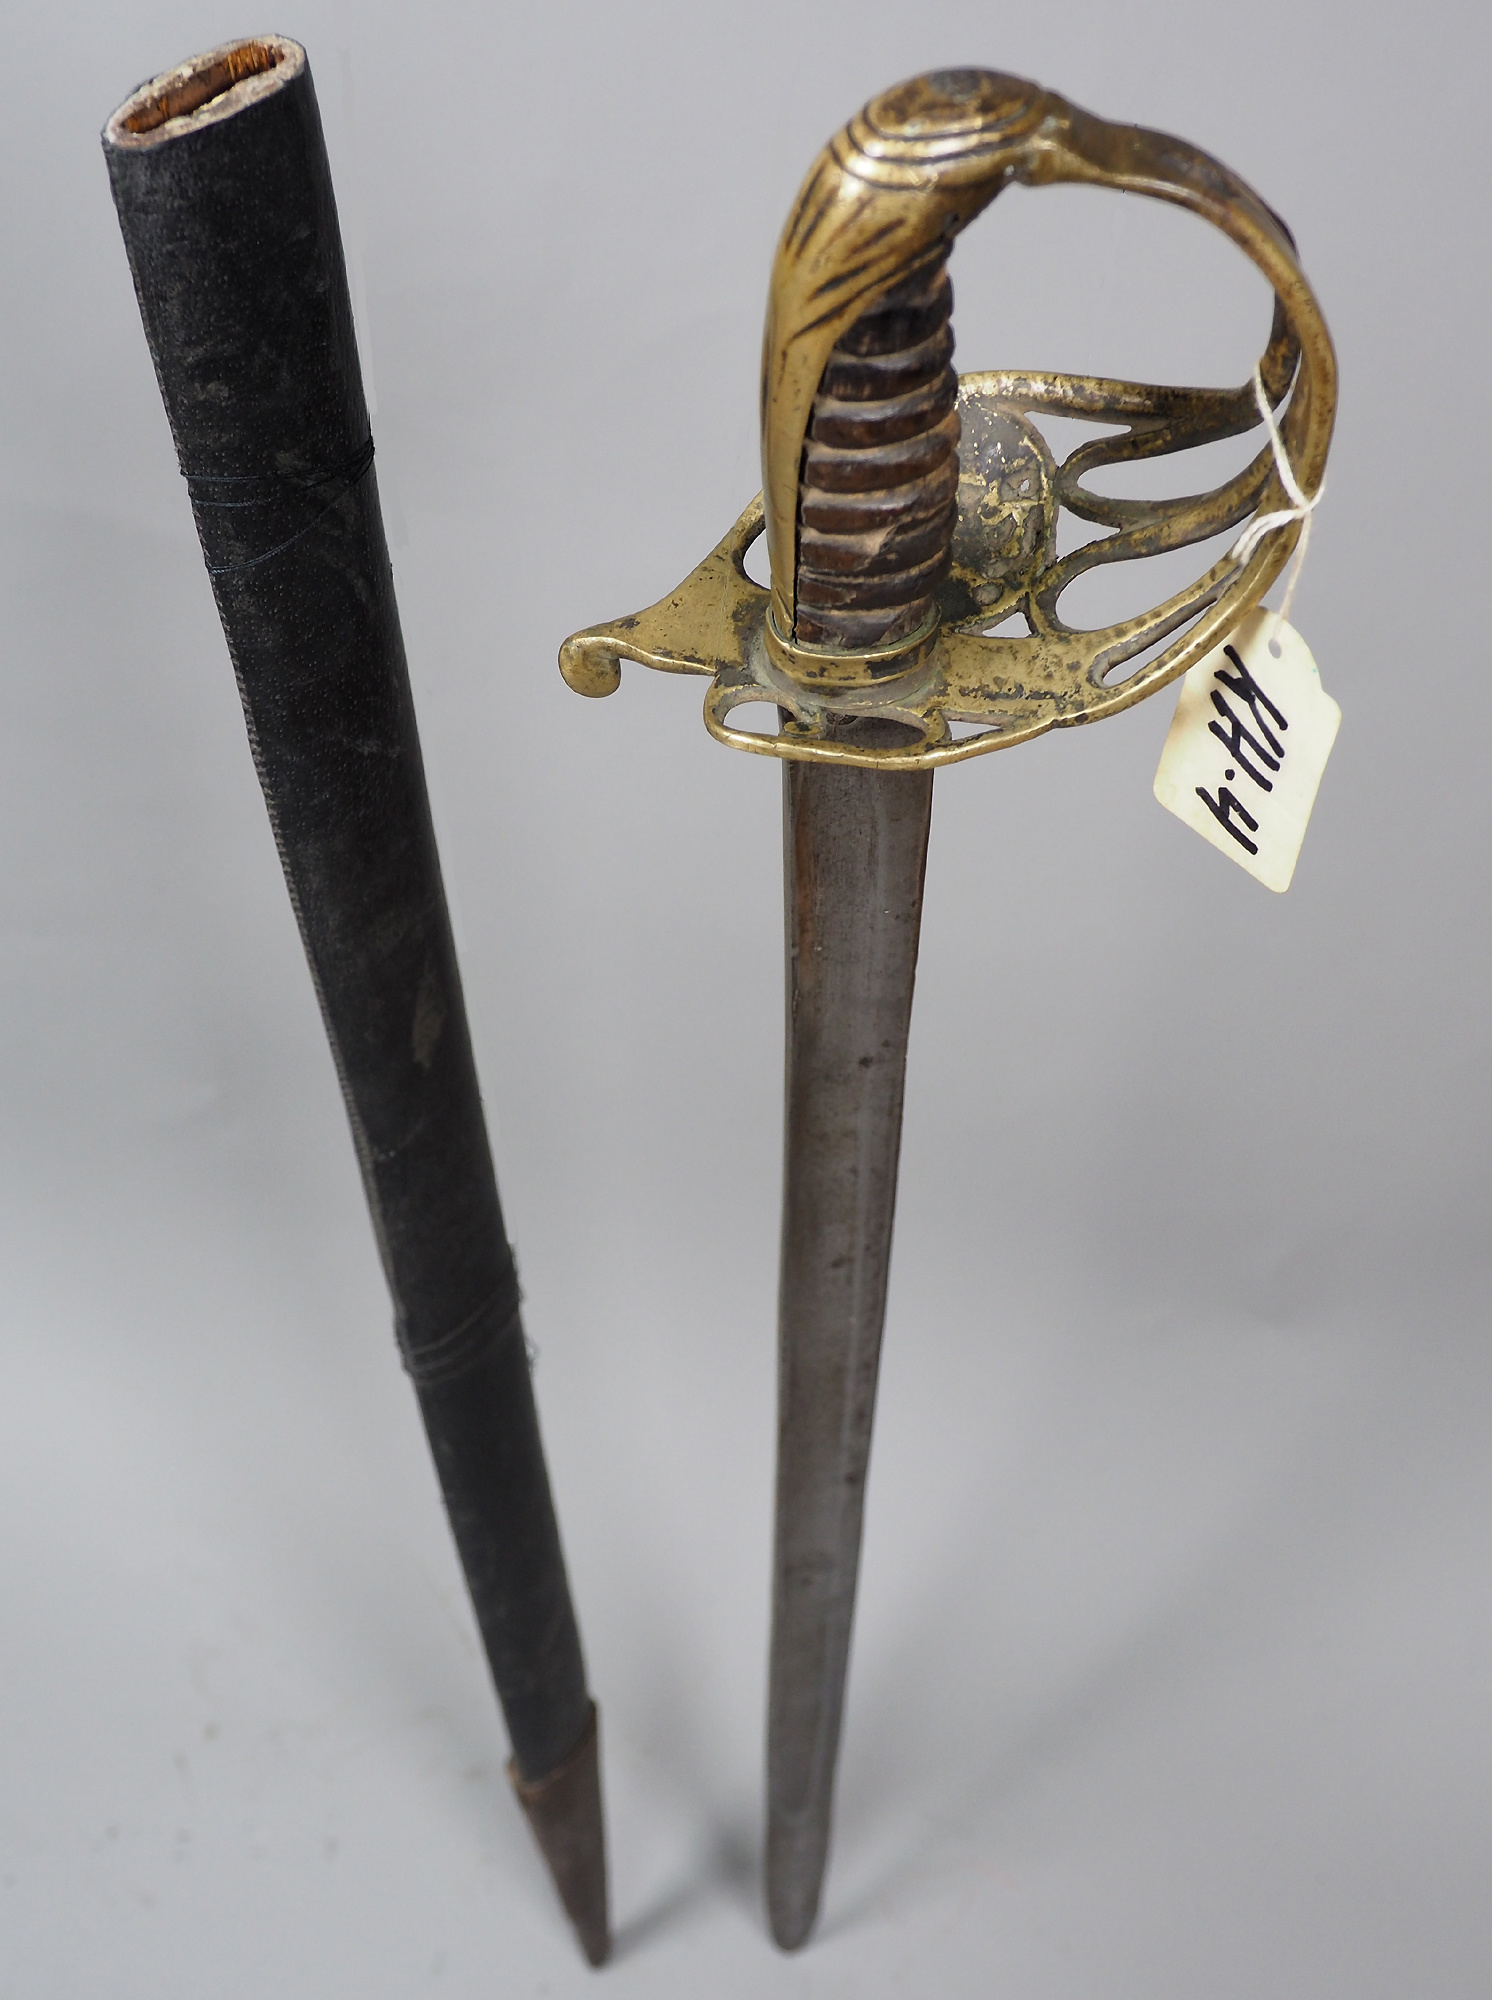 Antike Säbel messer schwert shamshir sword Knife aus Afghanistan Nr:KH28 - Copy